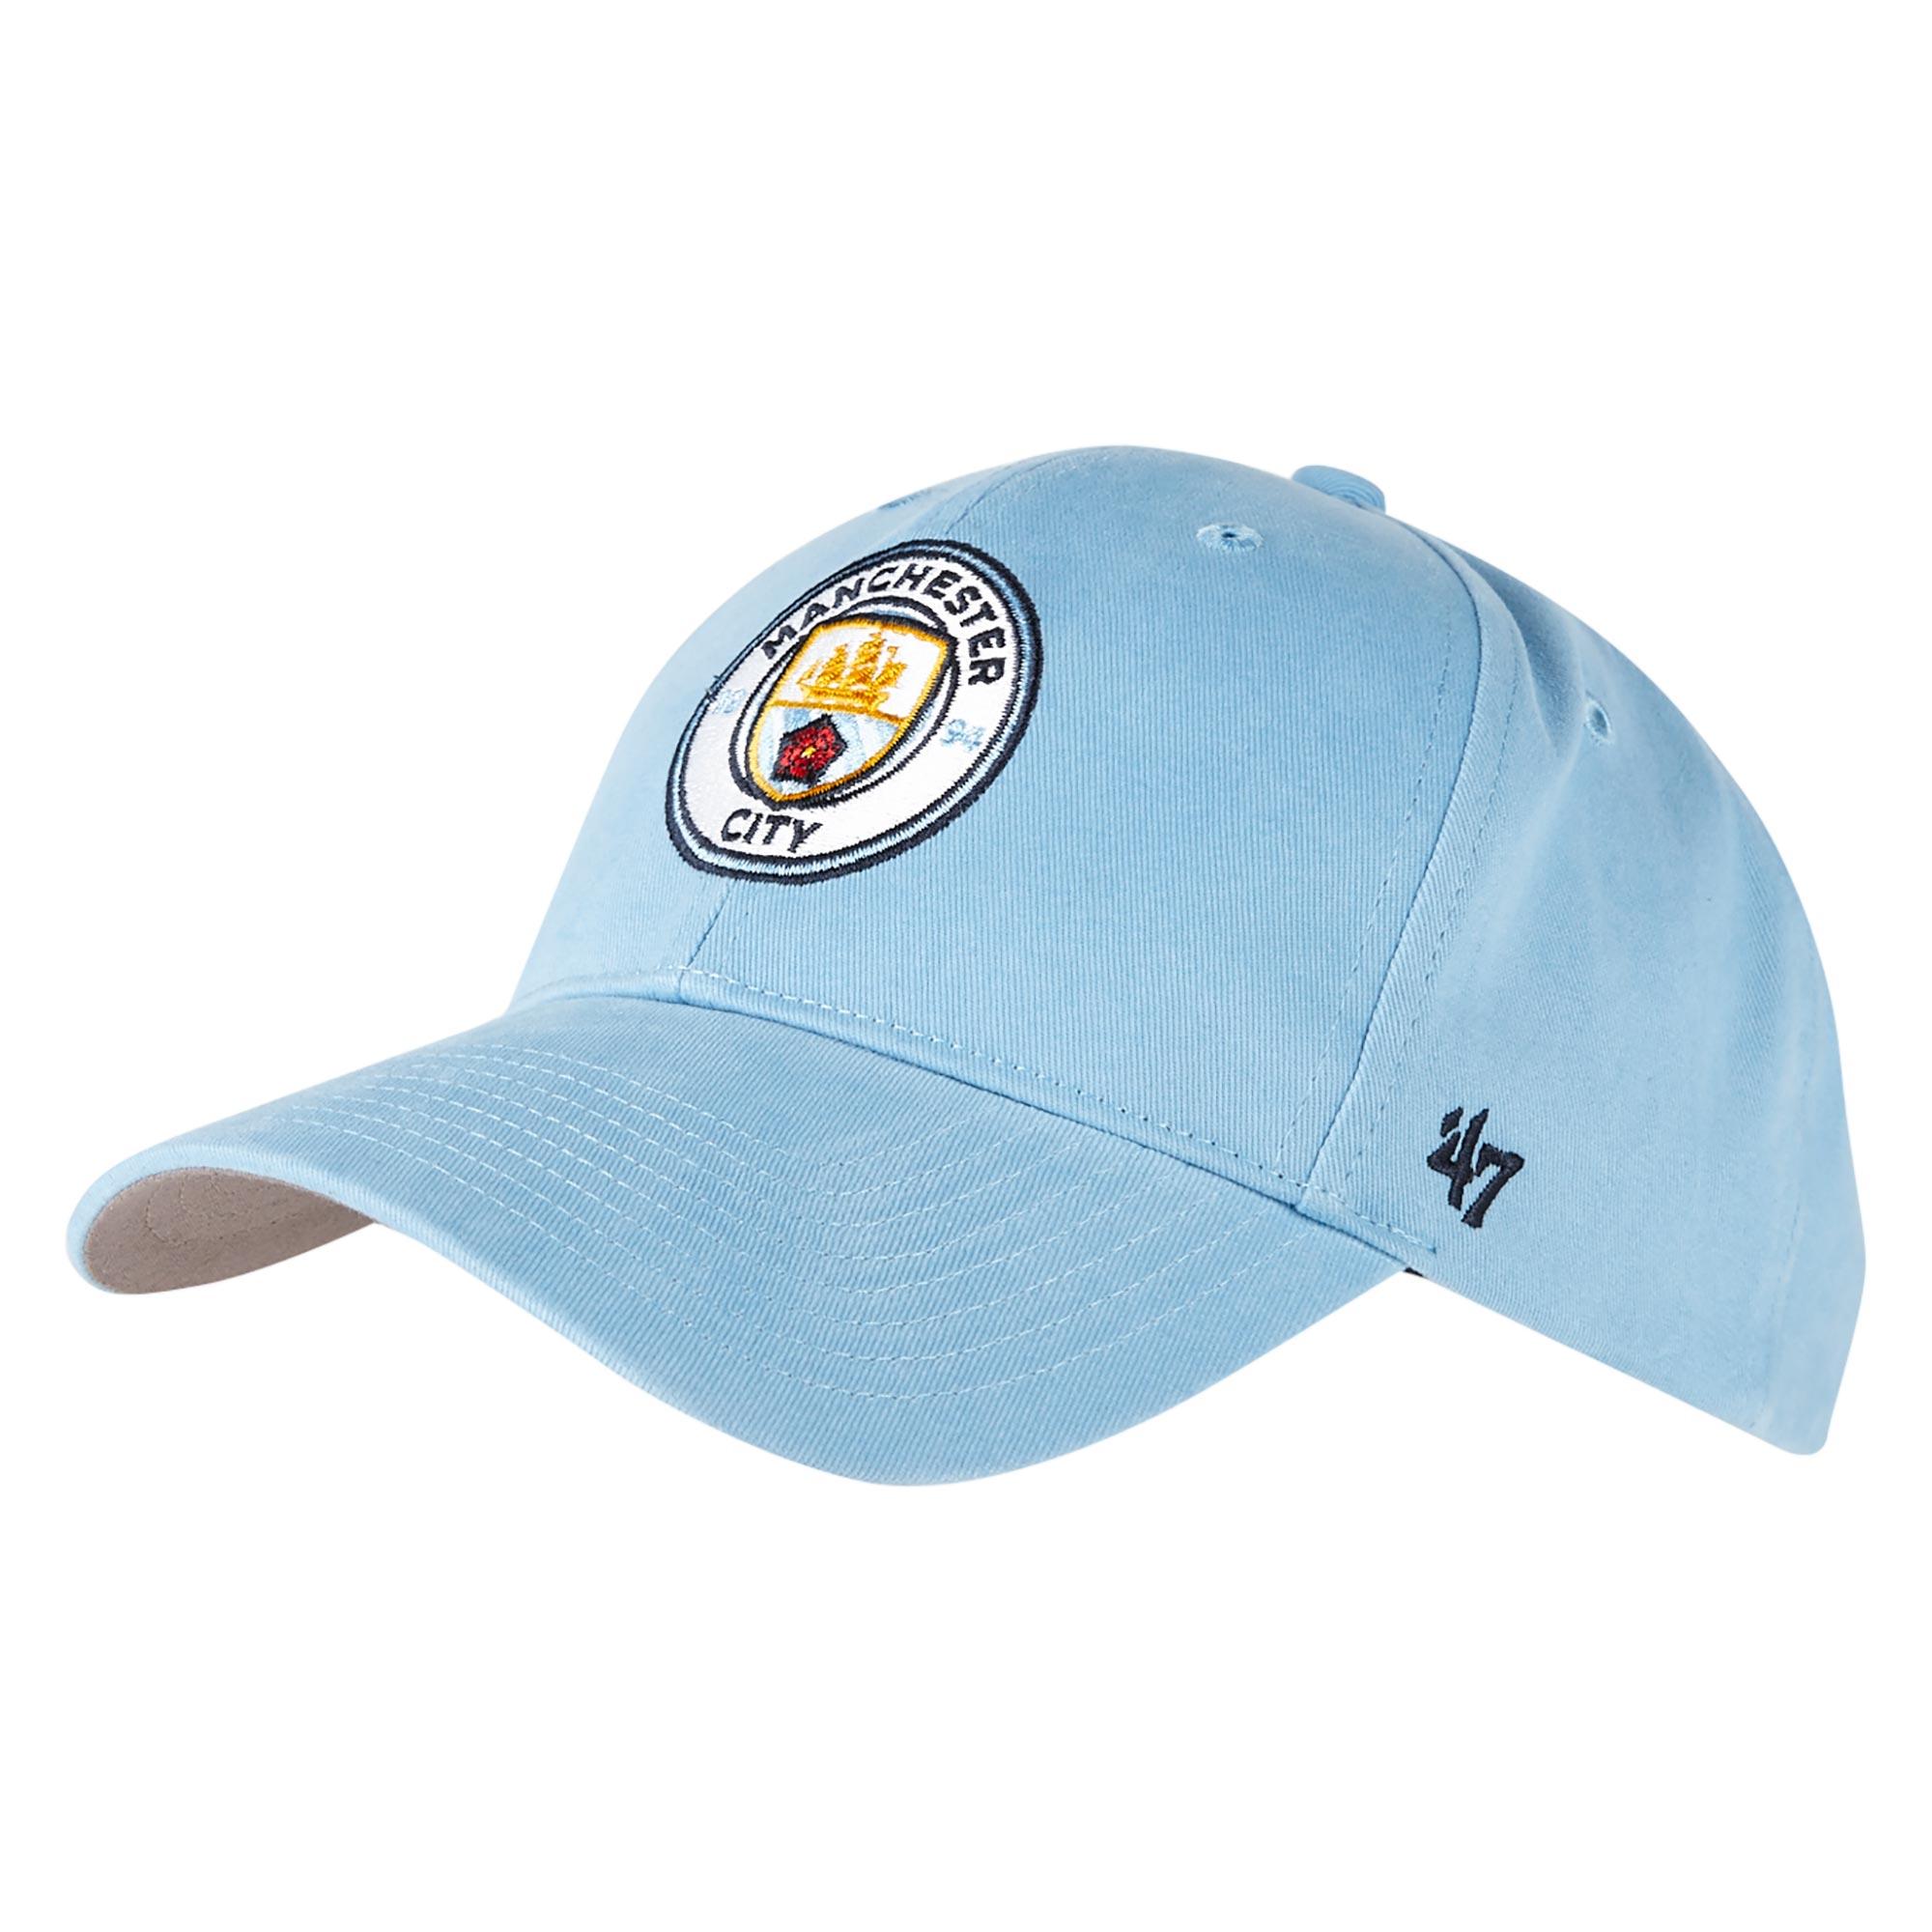 Manchester City 47 MVP Cap - Sky